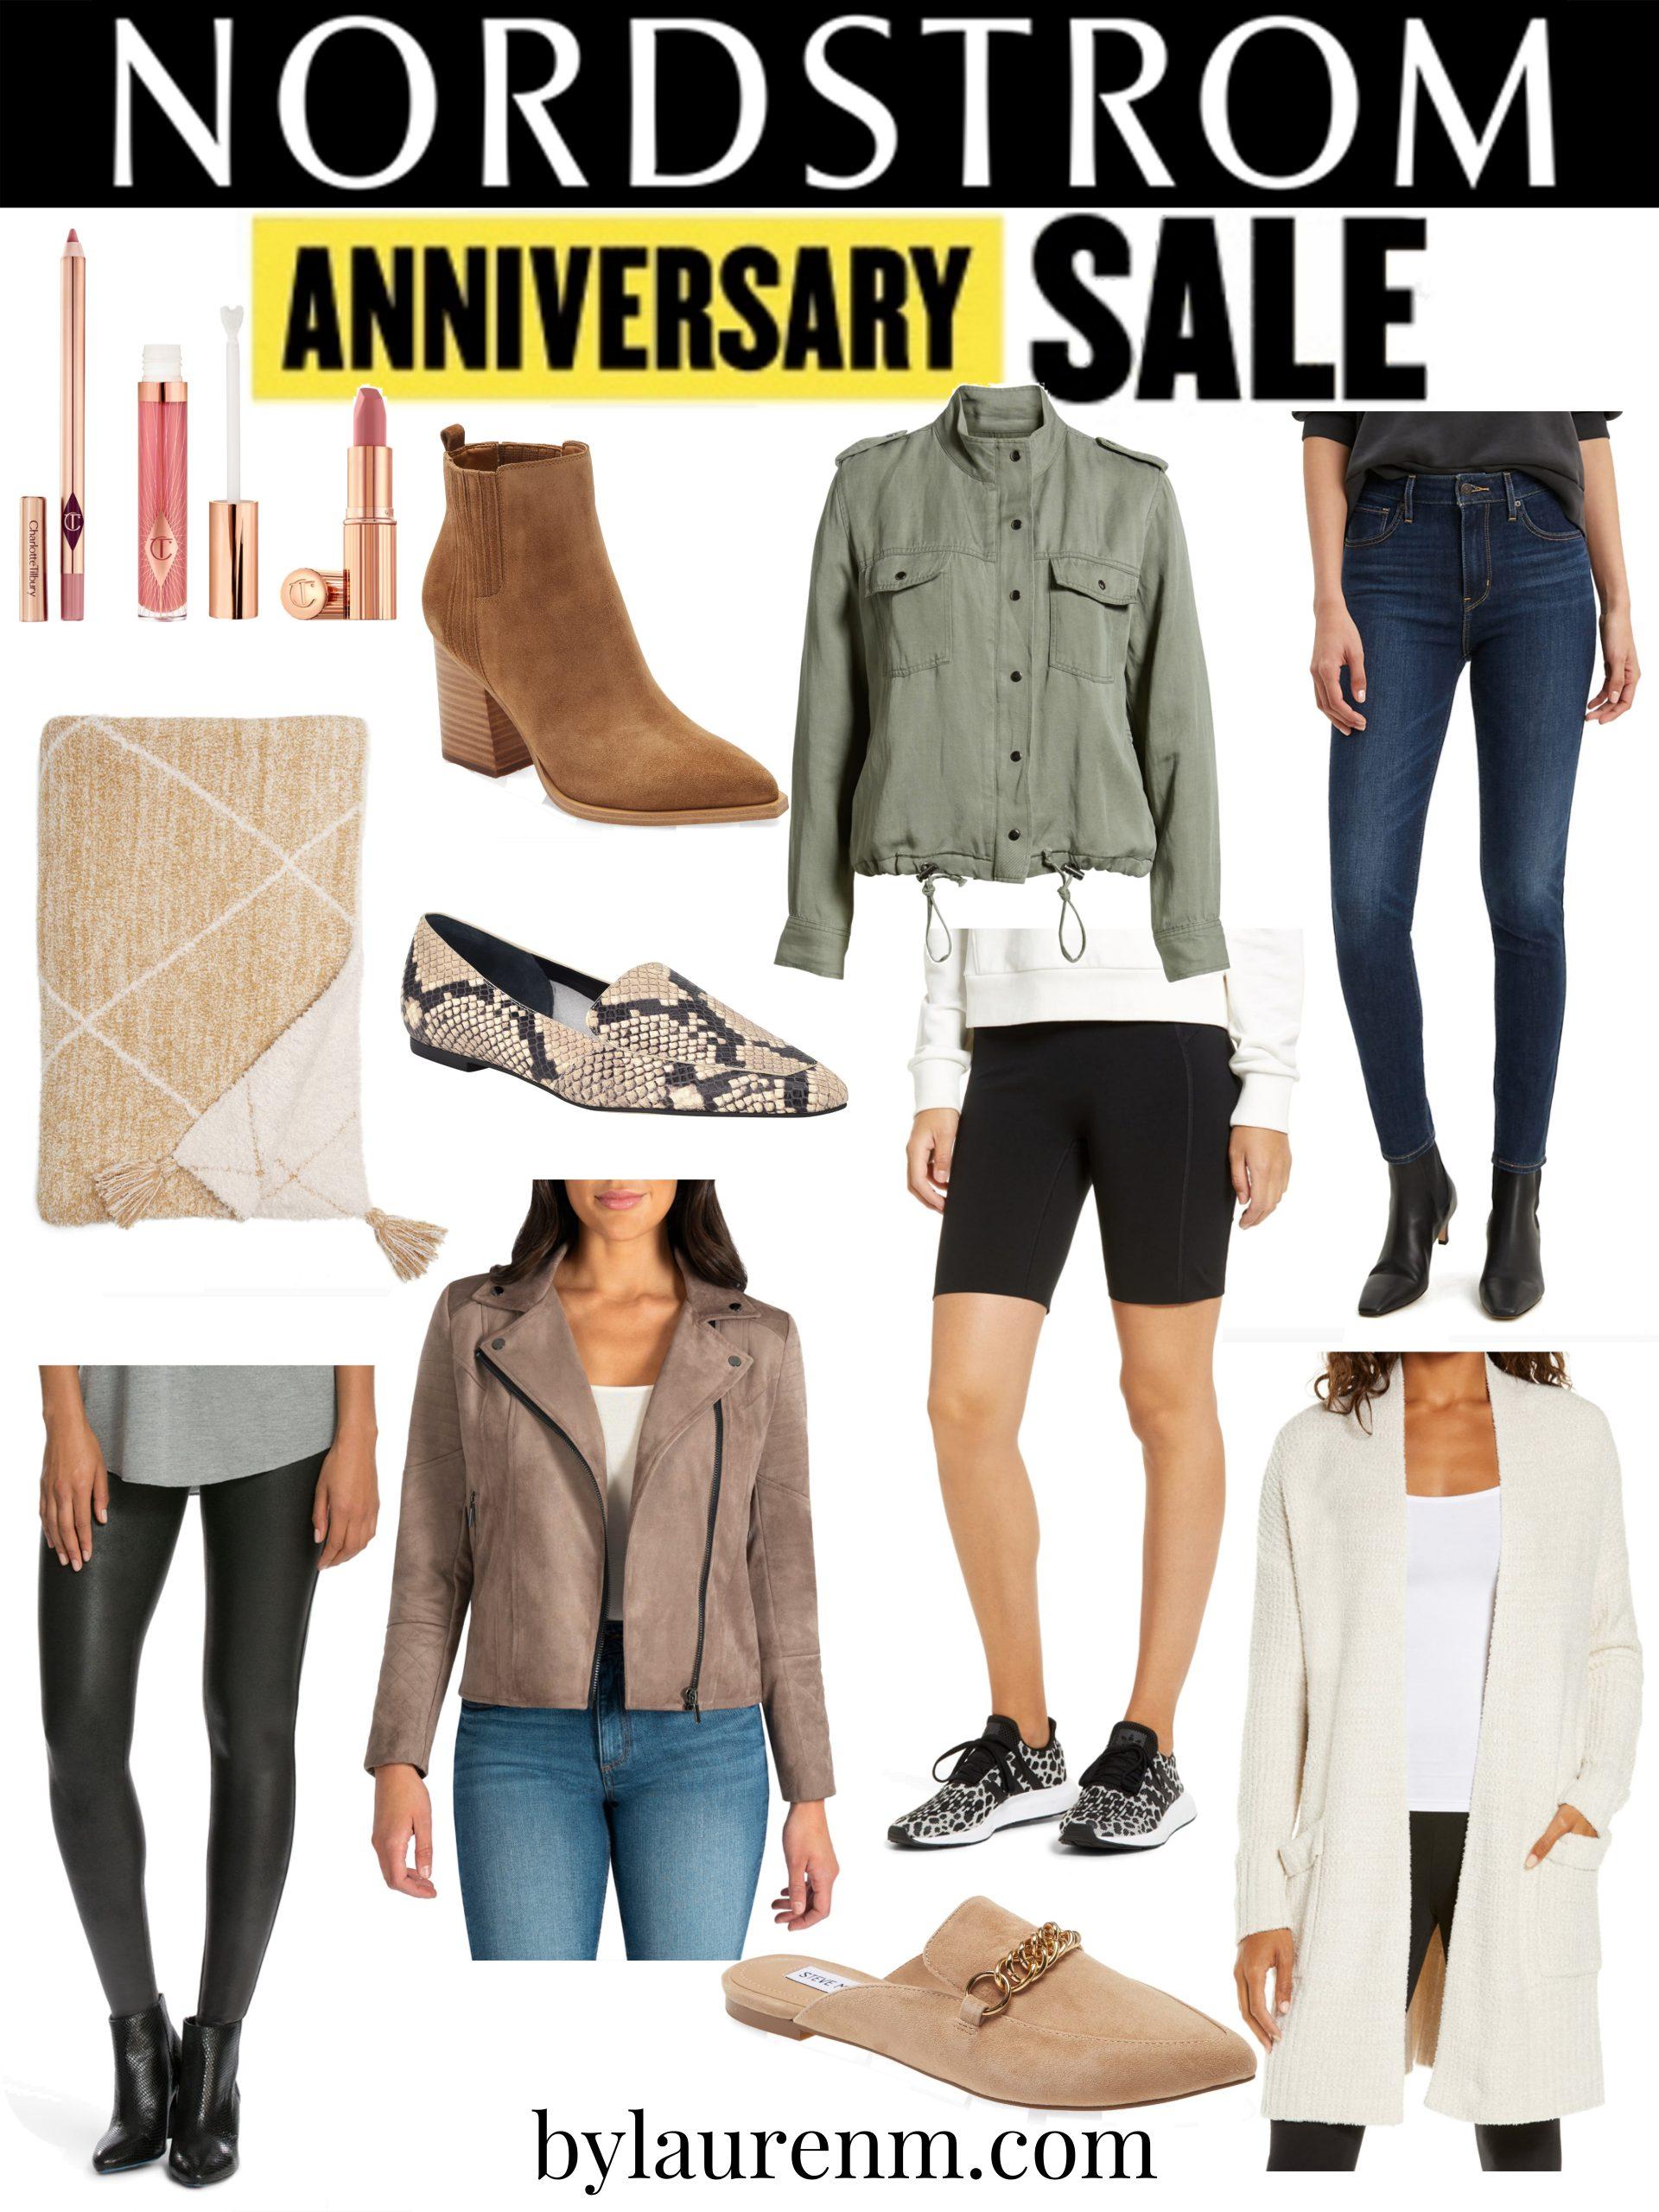 Virginia blogger, Lauren Dix, shares over ten of her favorite picks from the Nordstrom Anniversary Sale 2020!